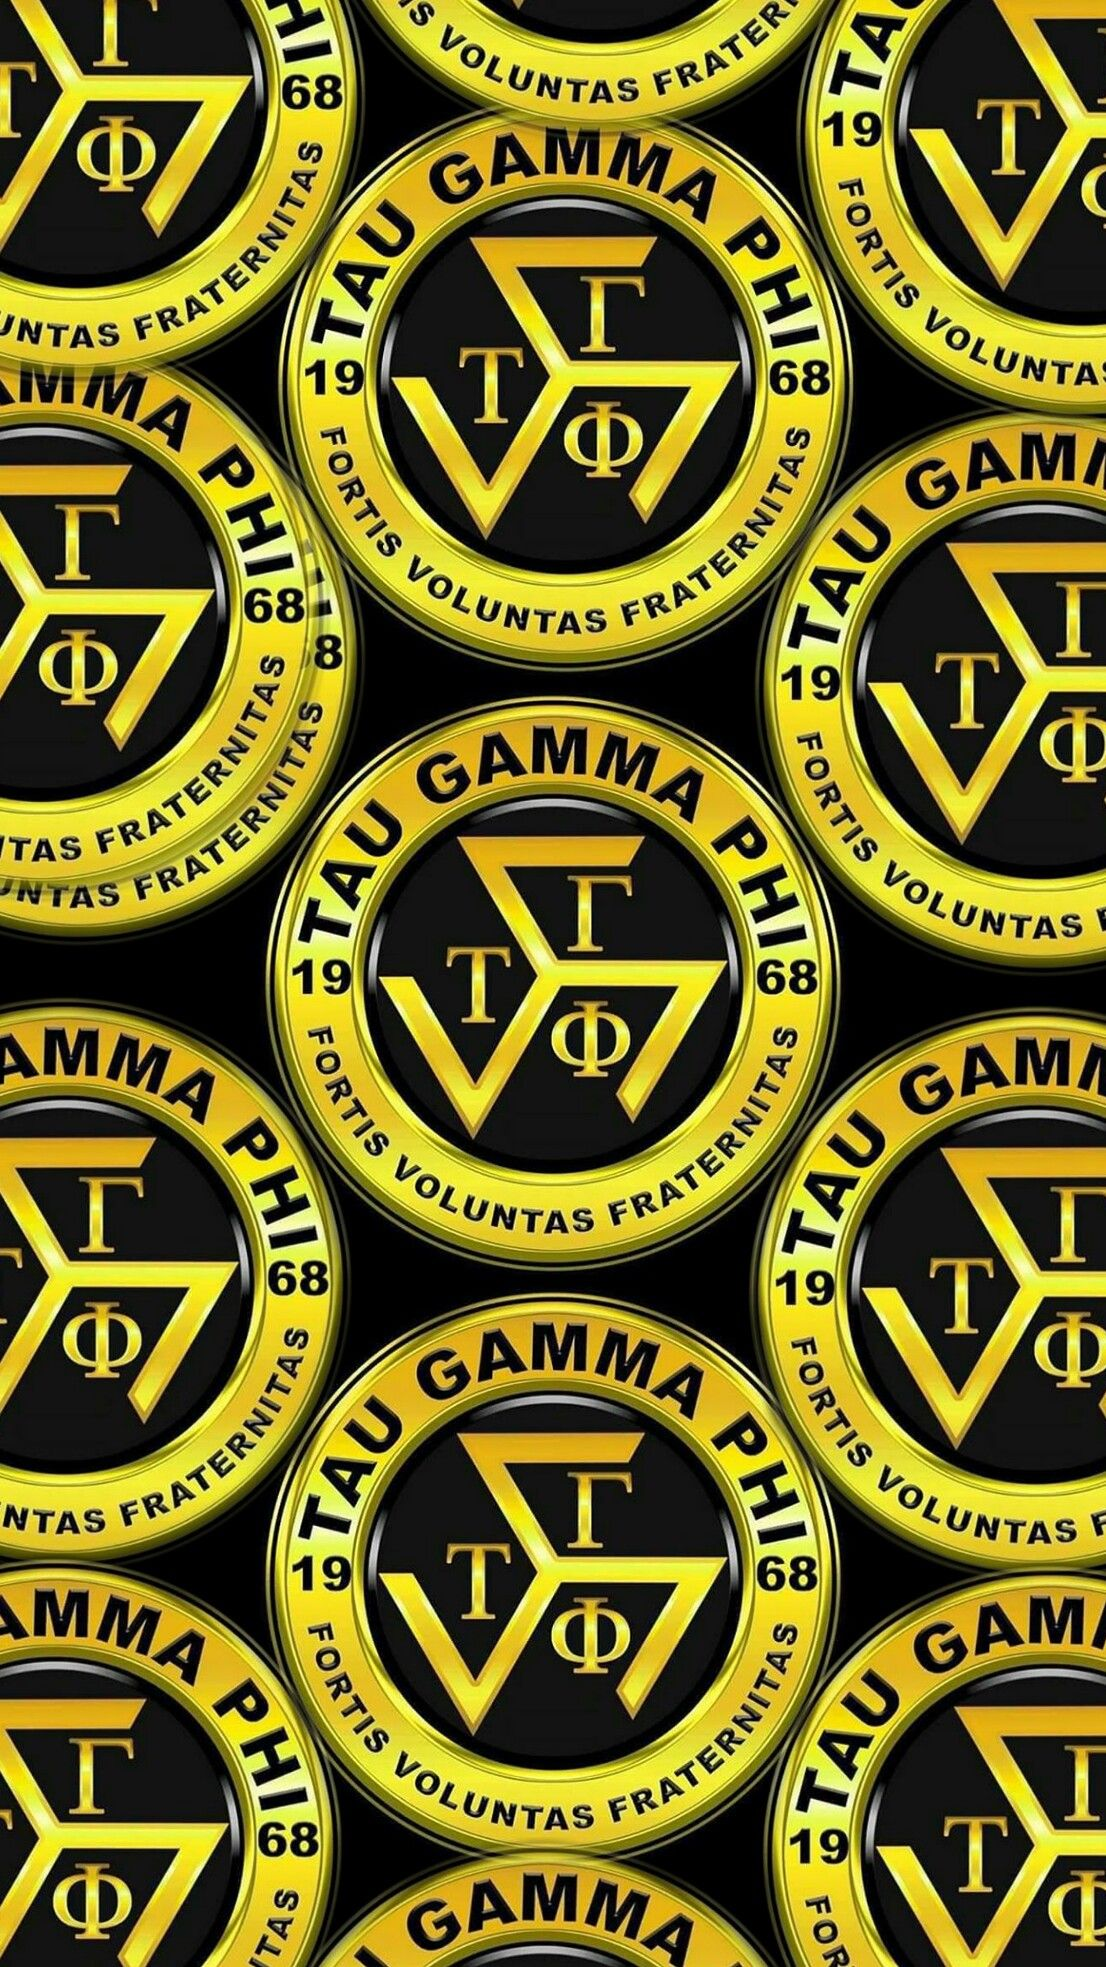 Triskelion Tau Gamma Wallpaper Gold 50 Android Iphone Gamma Tau Gamma Tau